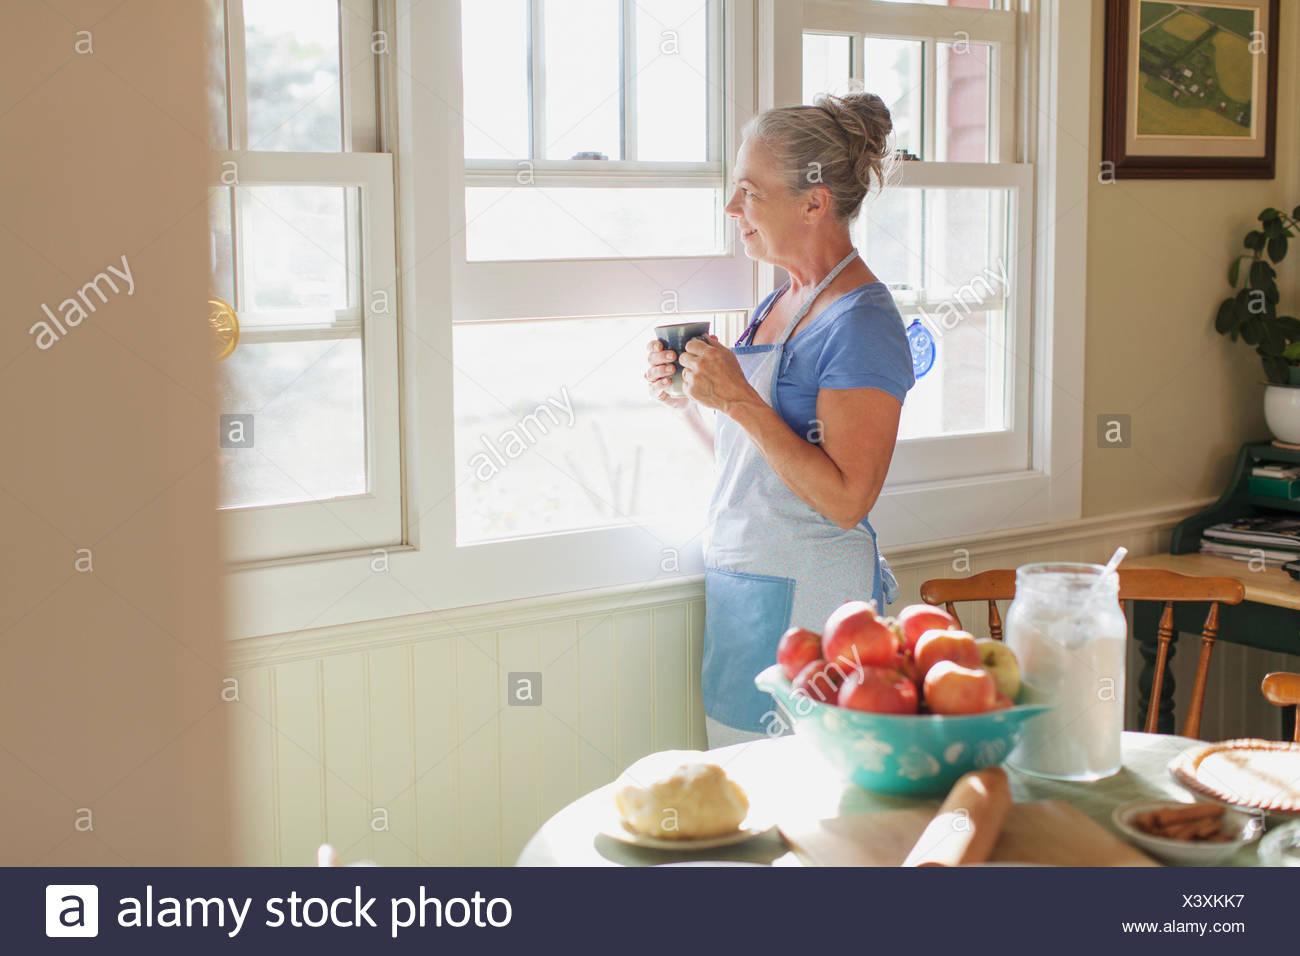 Woman gazing out window while enjoying coffee. - Stock Image